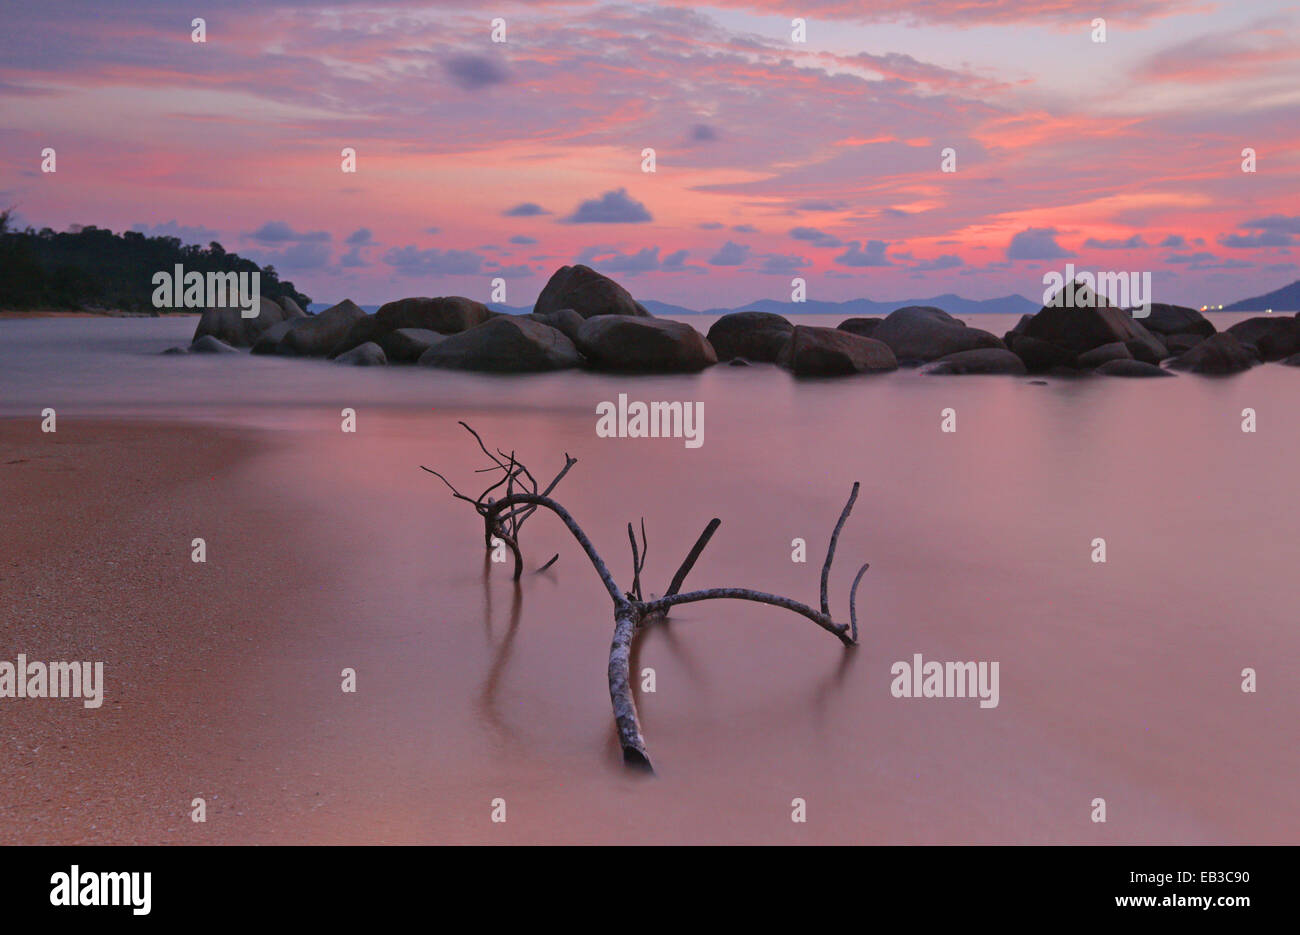 Indonesia, Singkawang, Kura Kura playa en el atardecer. Imagen De Stock